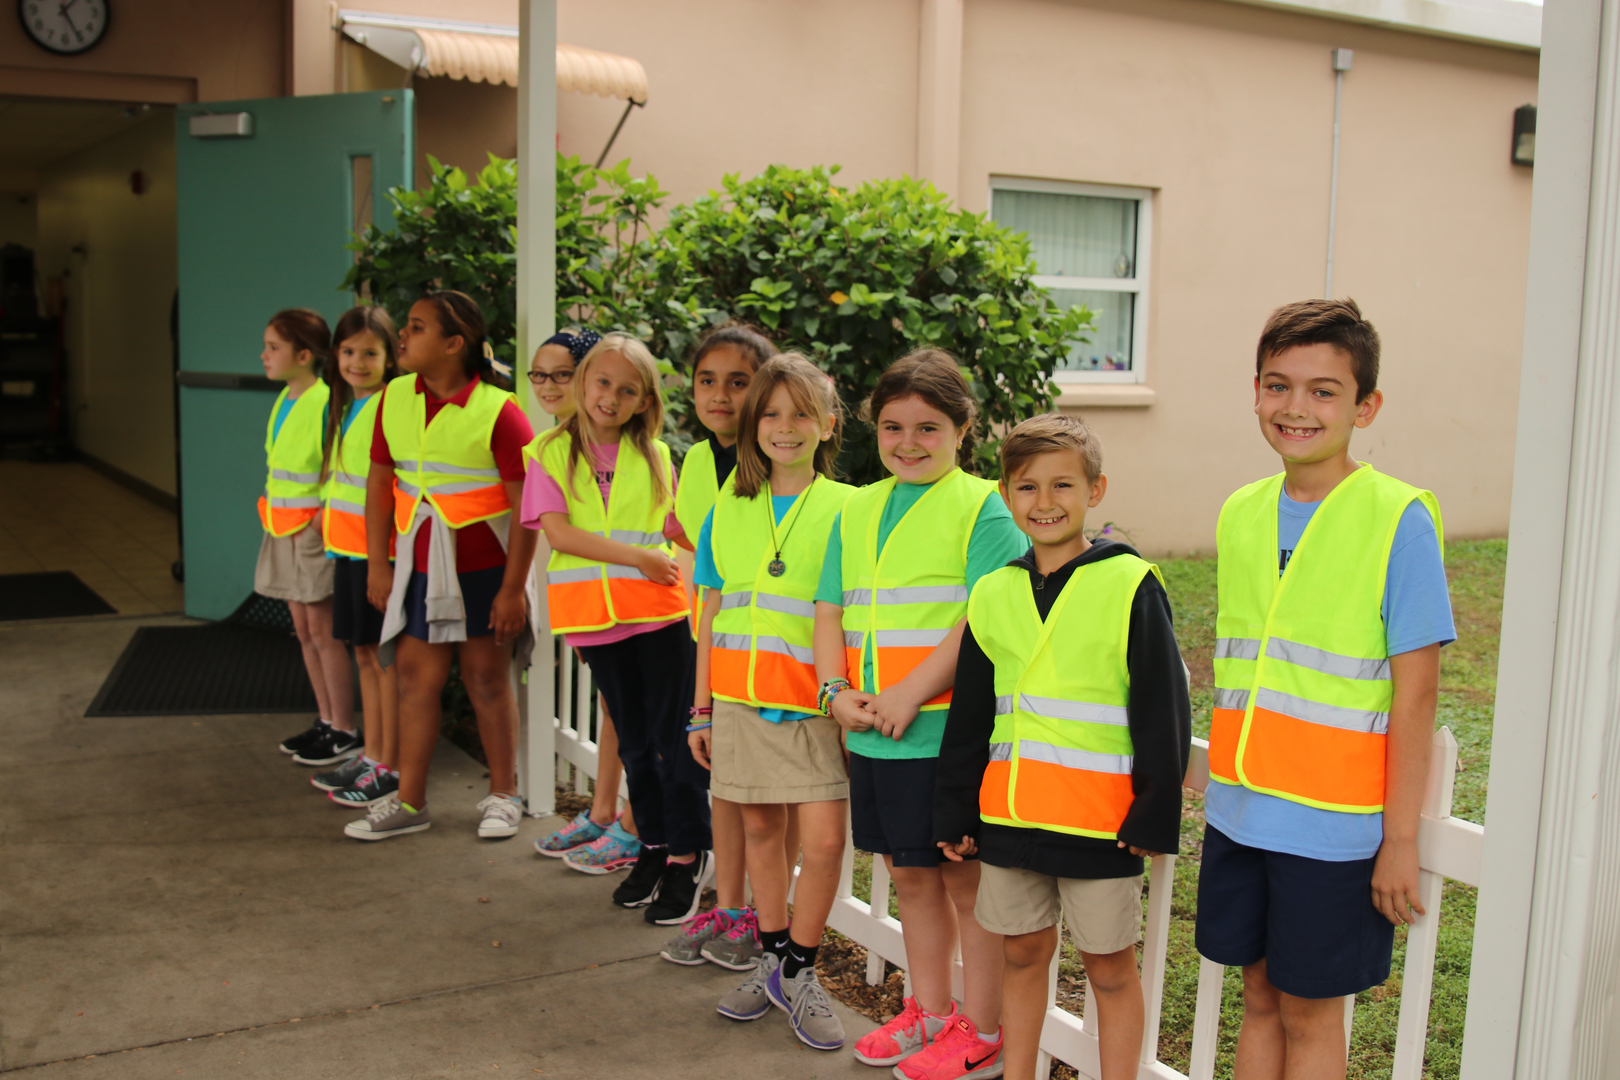 Pinellas Preparatory Academy - K12 Education, Preparatory Education 4-8,  Primary Education K-3